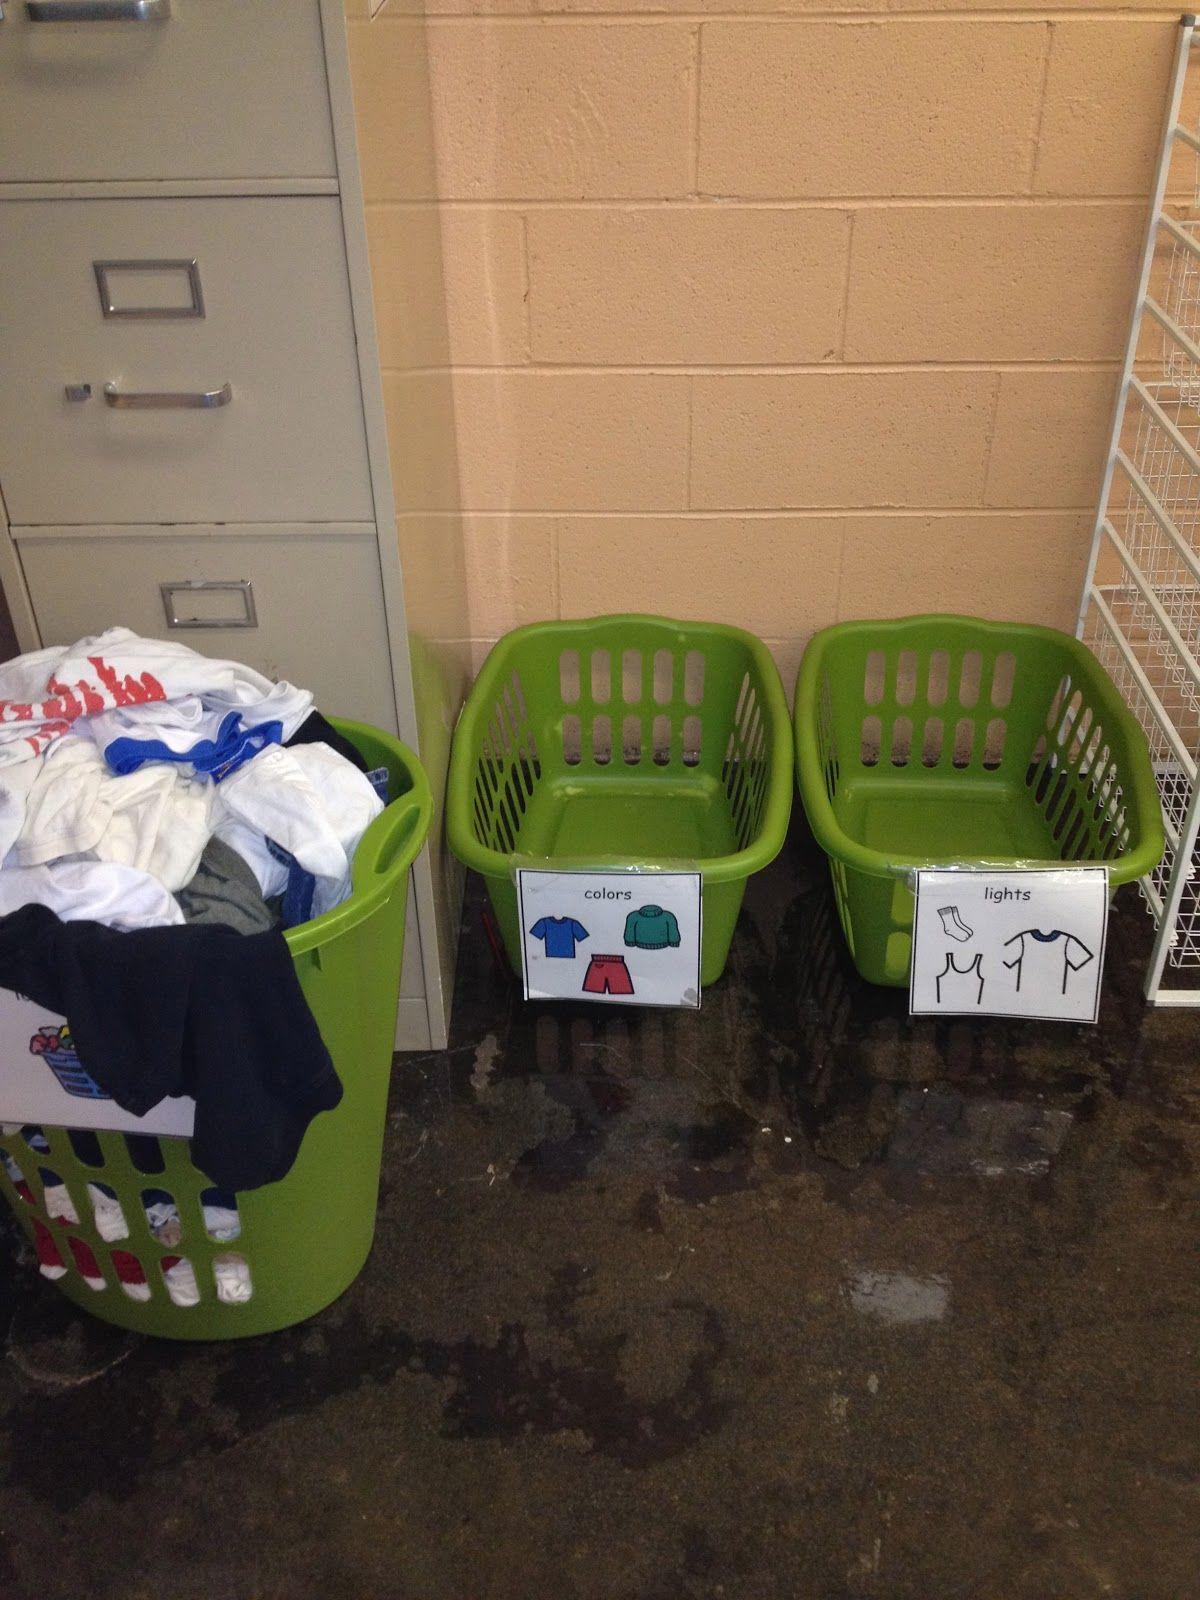 Sorting Laundry Light Vs Dark The Autism Tank